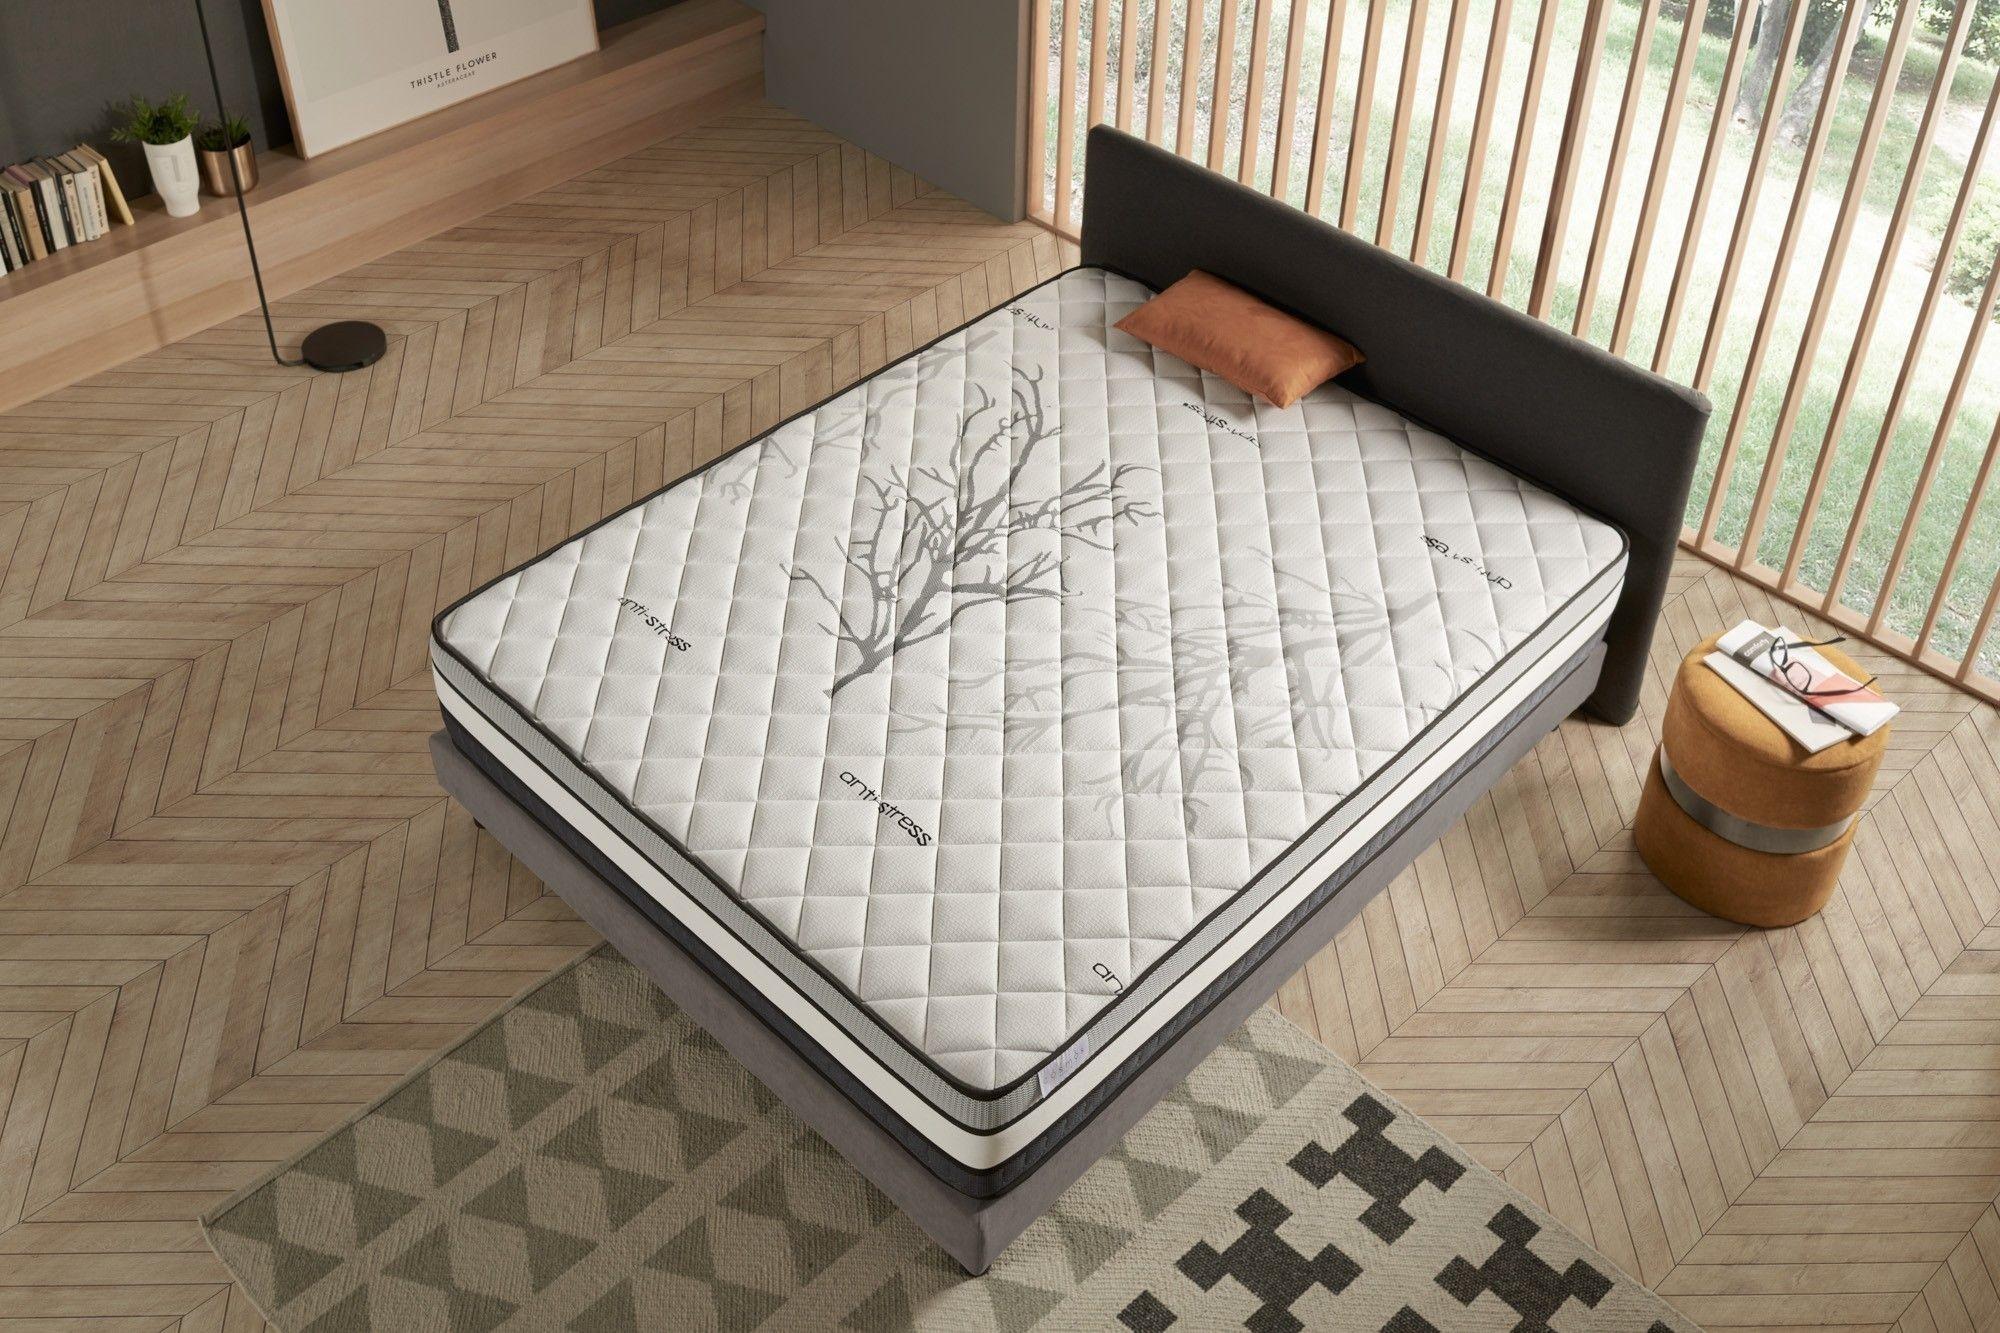 Solar High End Memory Foam Madrass | Cosmos sengetøy | Tykkelse: 30 cm